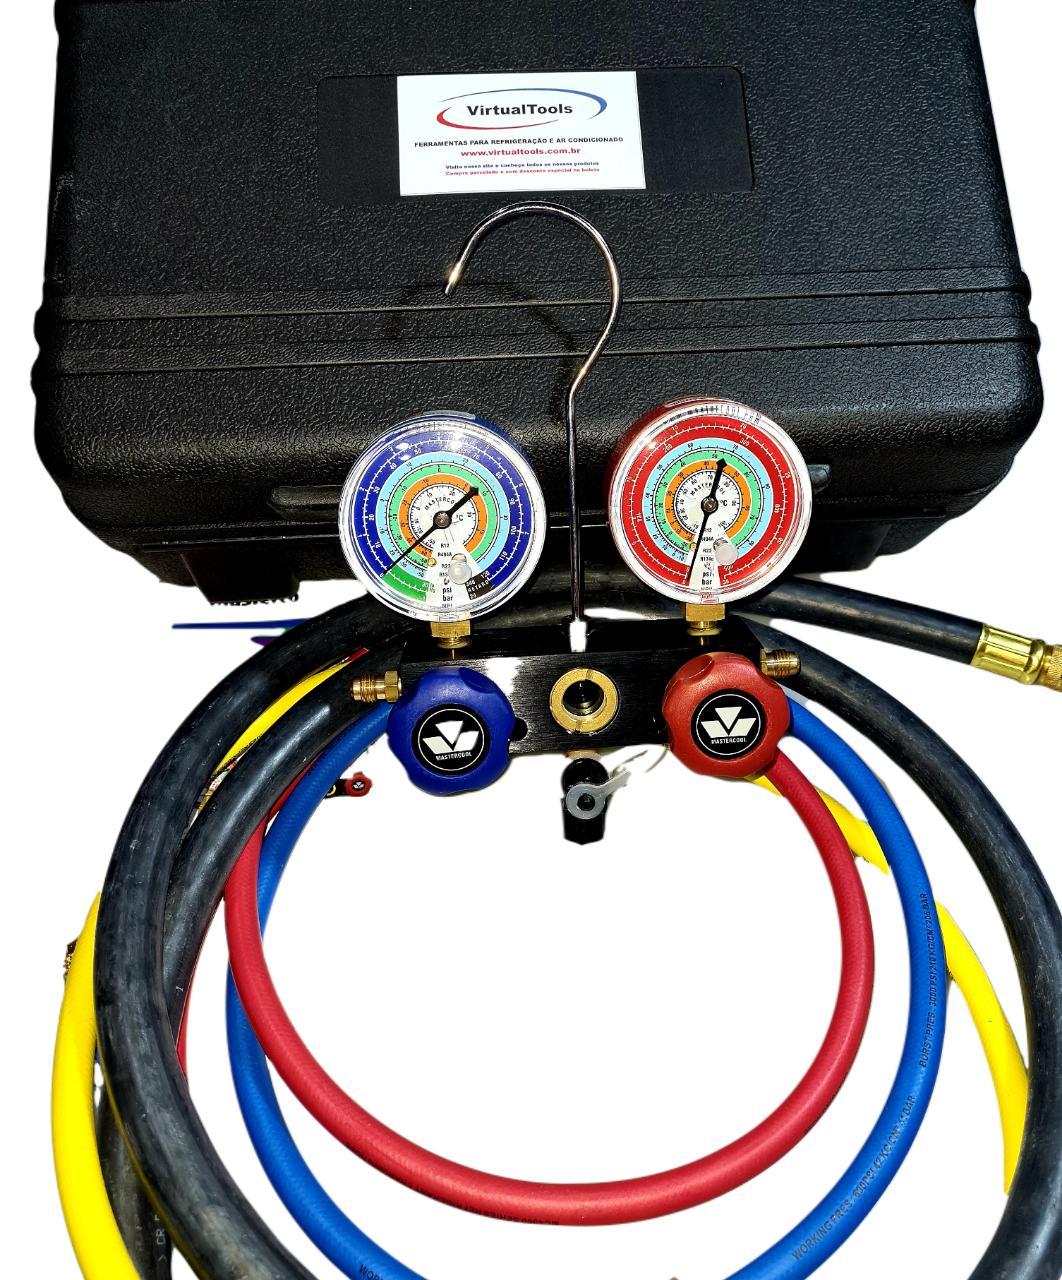 Kit Manifold Mastercool R12/R22/R134a/R404a 93636-MRk - com maleta e mangueira de vácuo